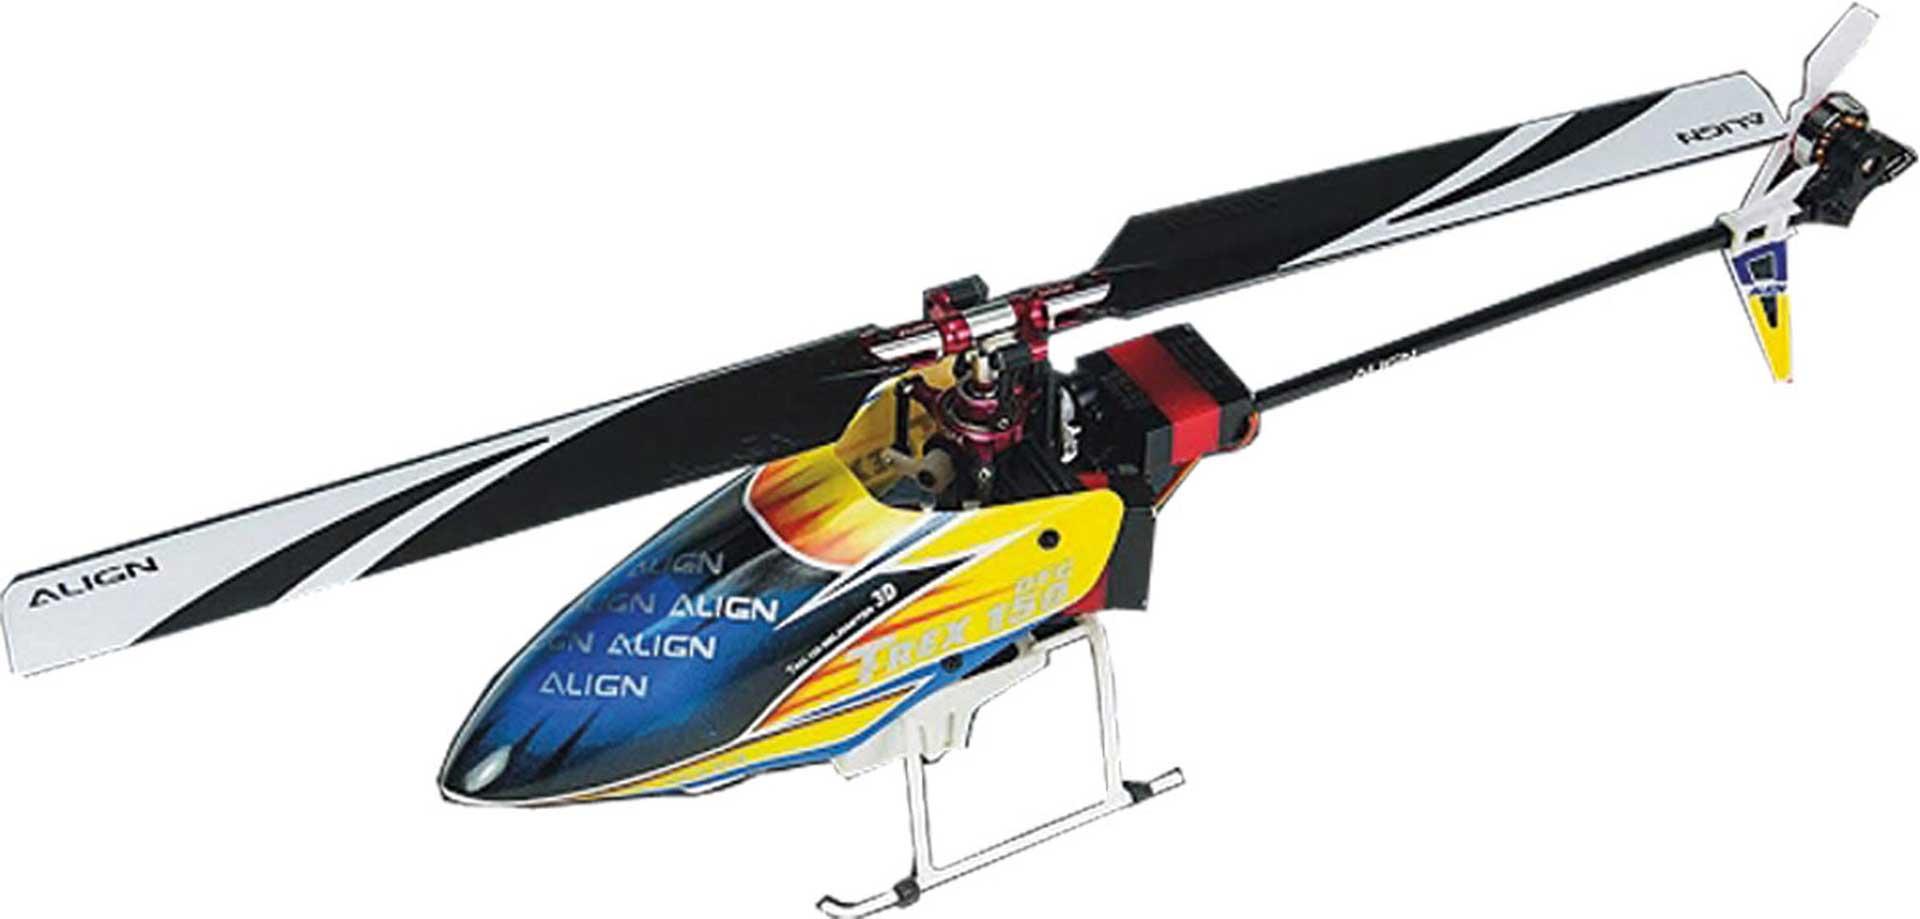 ALIGN T-REX 150X DFC SUPER COMBO BTF